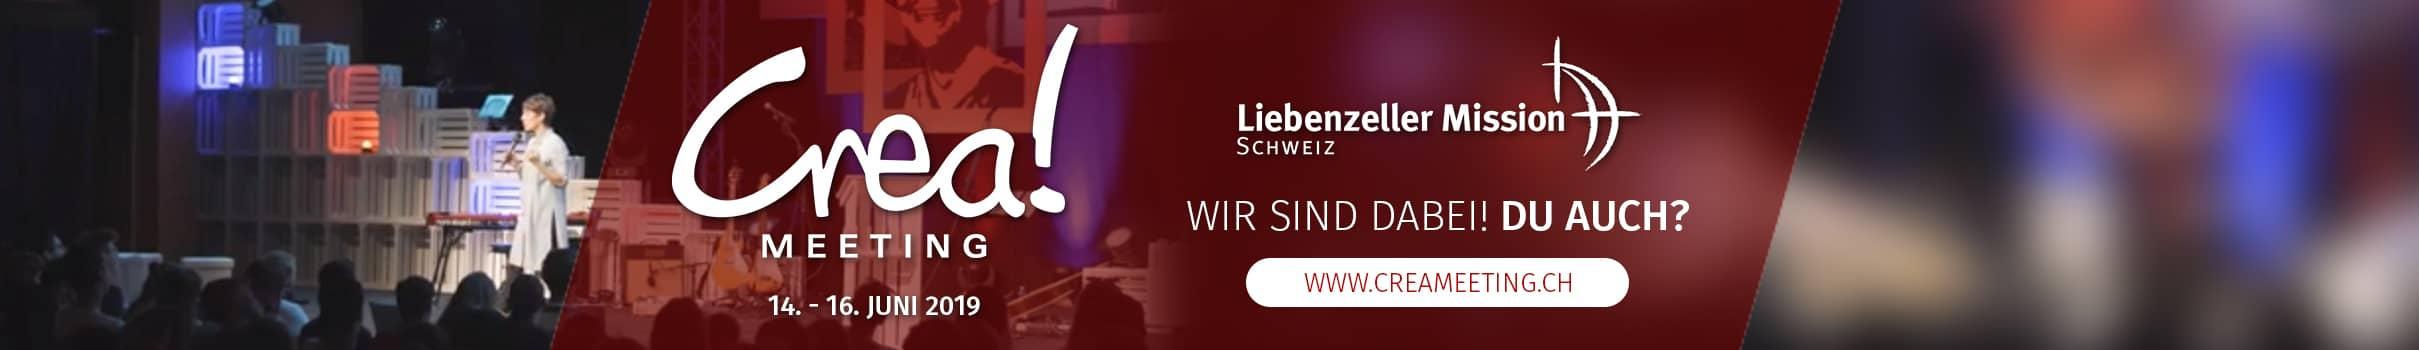 Sehen wir uns bei CREA 2019? www.creameeting.ch